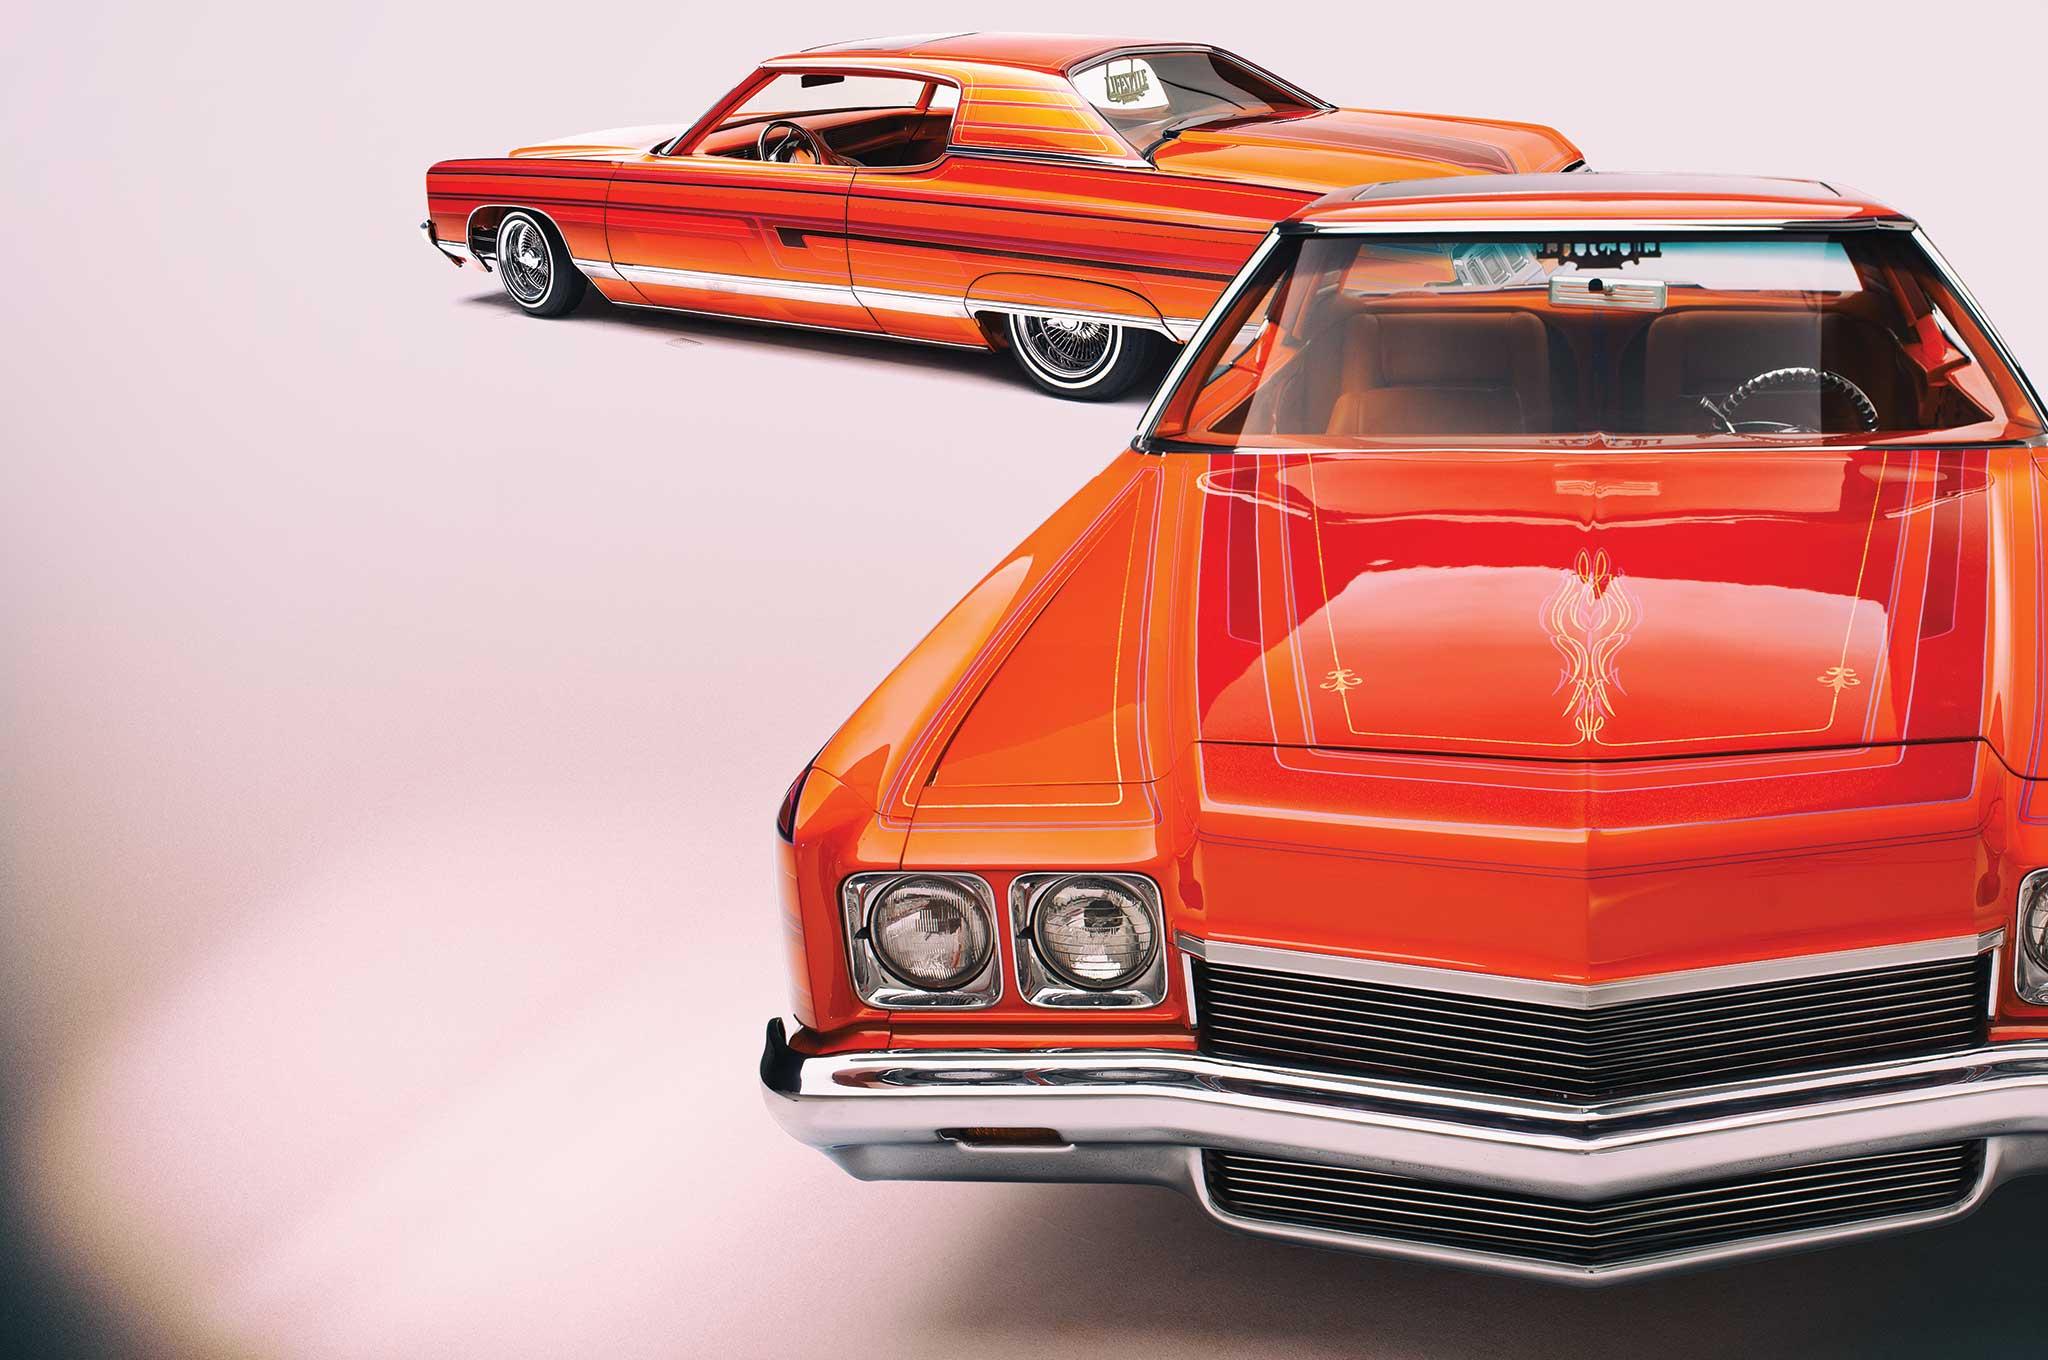 1972 Chevrolet Caprice - Serial Thriller